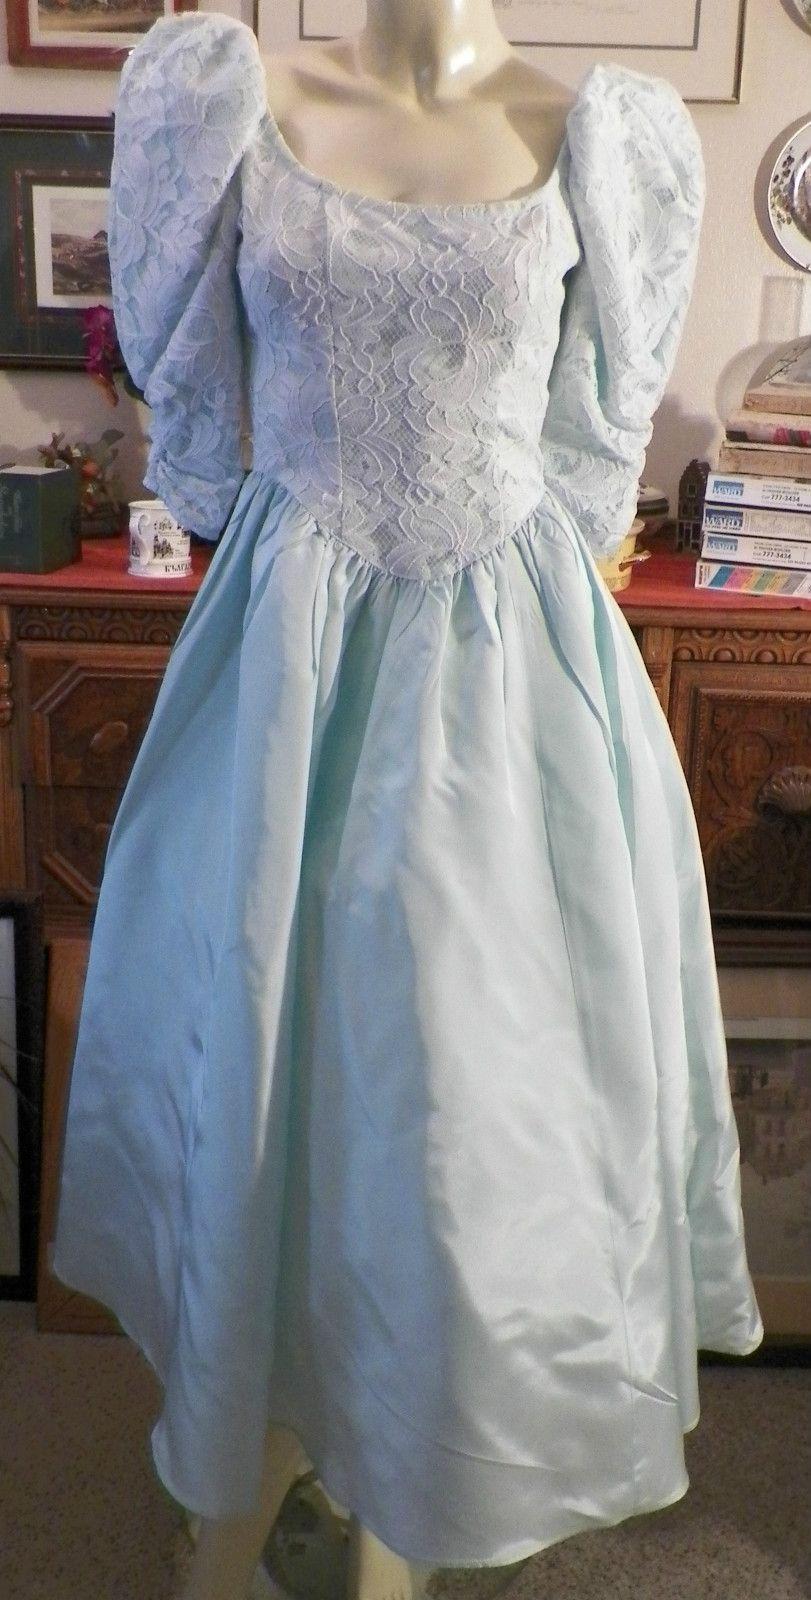 Vintage 70 S Gunne Sax Jessica Mcclintock Blue Lace Taffeta Prom Formal Dress 3 Ebay Formal Dresses Prom Dresses Formal Dresses [ 1600 x 811 Pixel ]